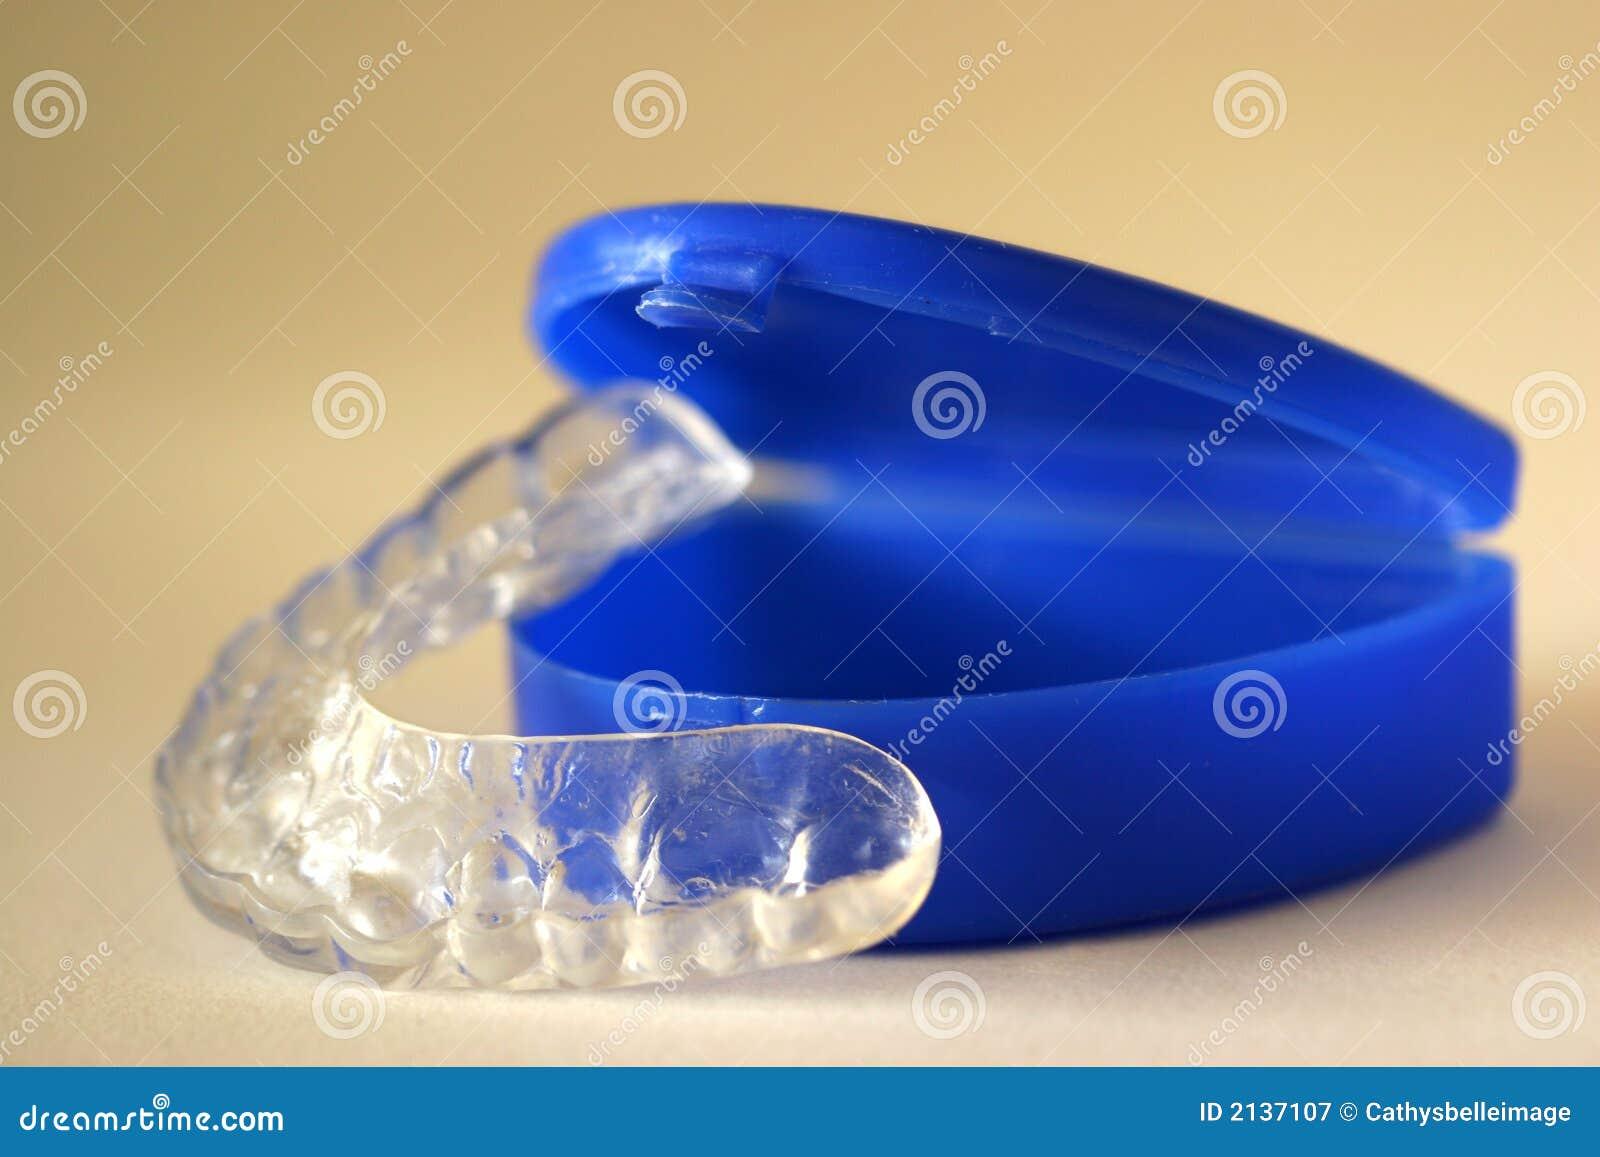 mouth guard